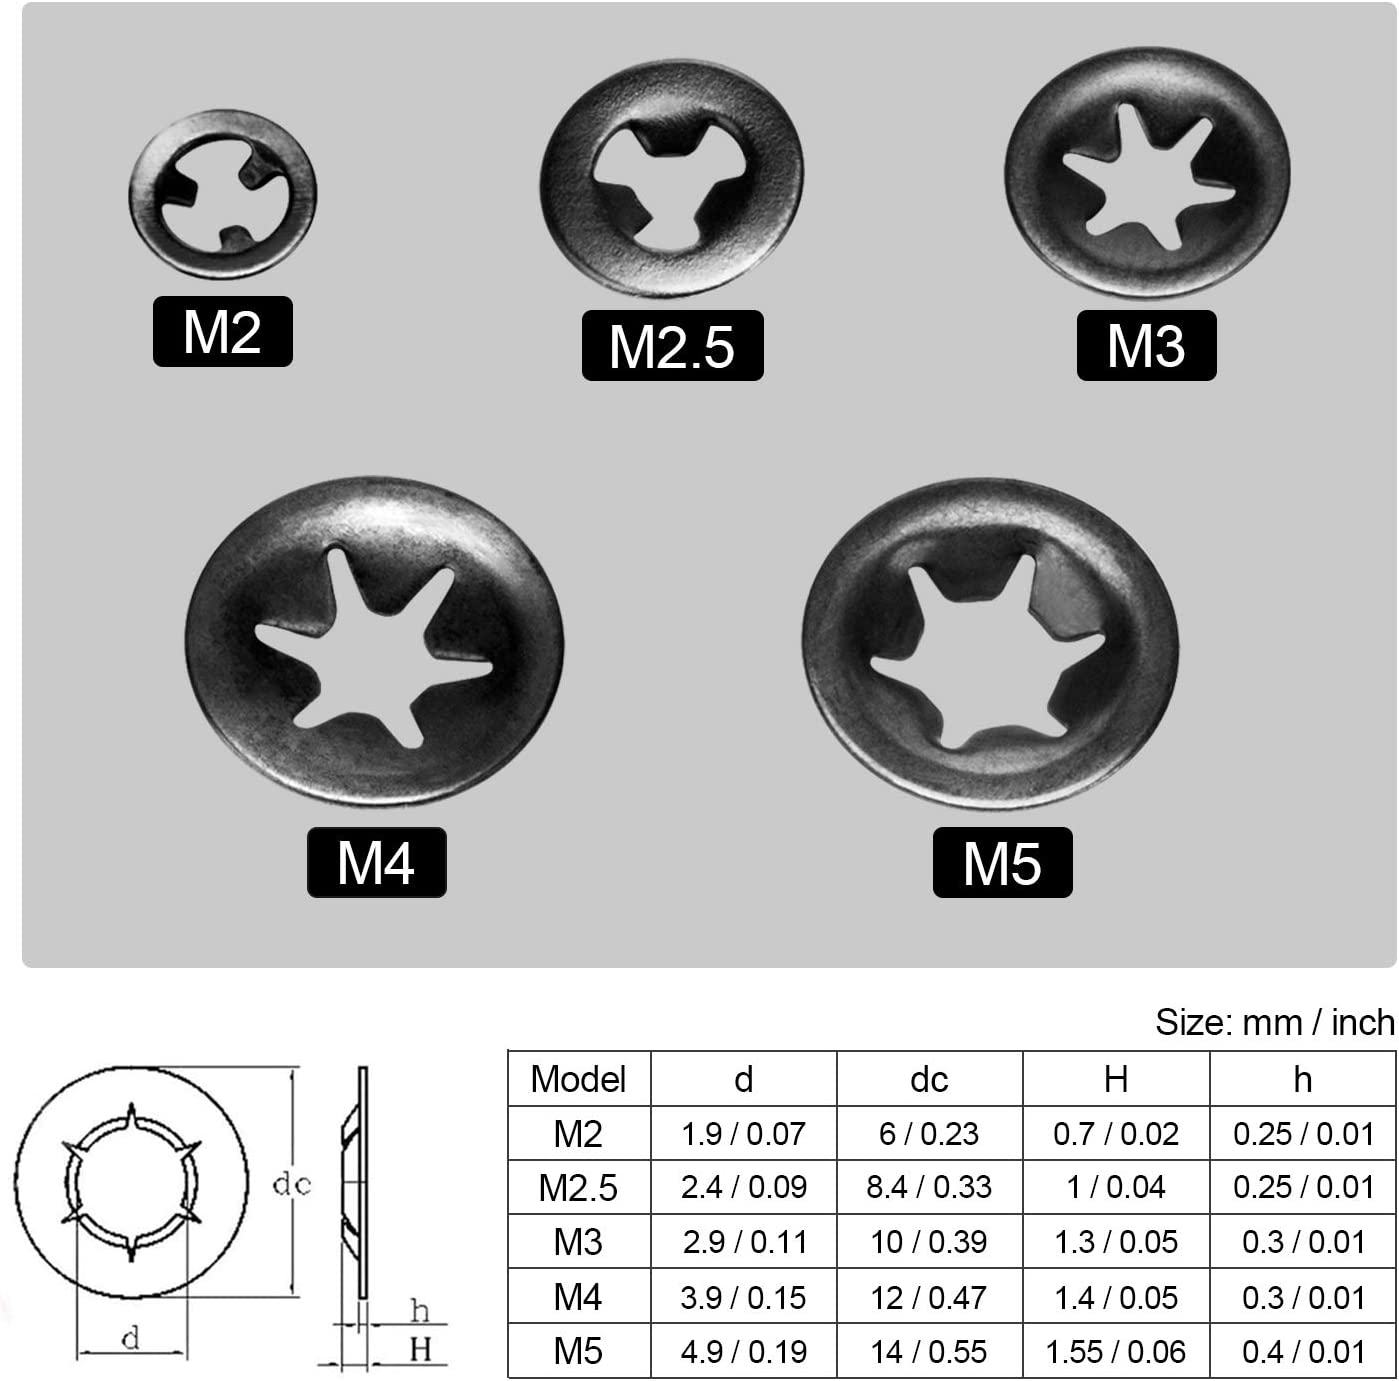 5 Sizes OIIKI 200pcs M2//M2.5//M3//M4//M5 Internal Tooth Starlock Washers Push On Speed Clips Fasteners Assortment Kit 65 Mn Steel Star Lock Washers-40pcs Each Size Quick Speed Locking Washers